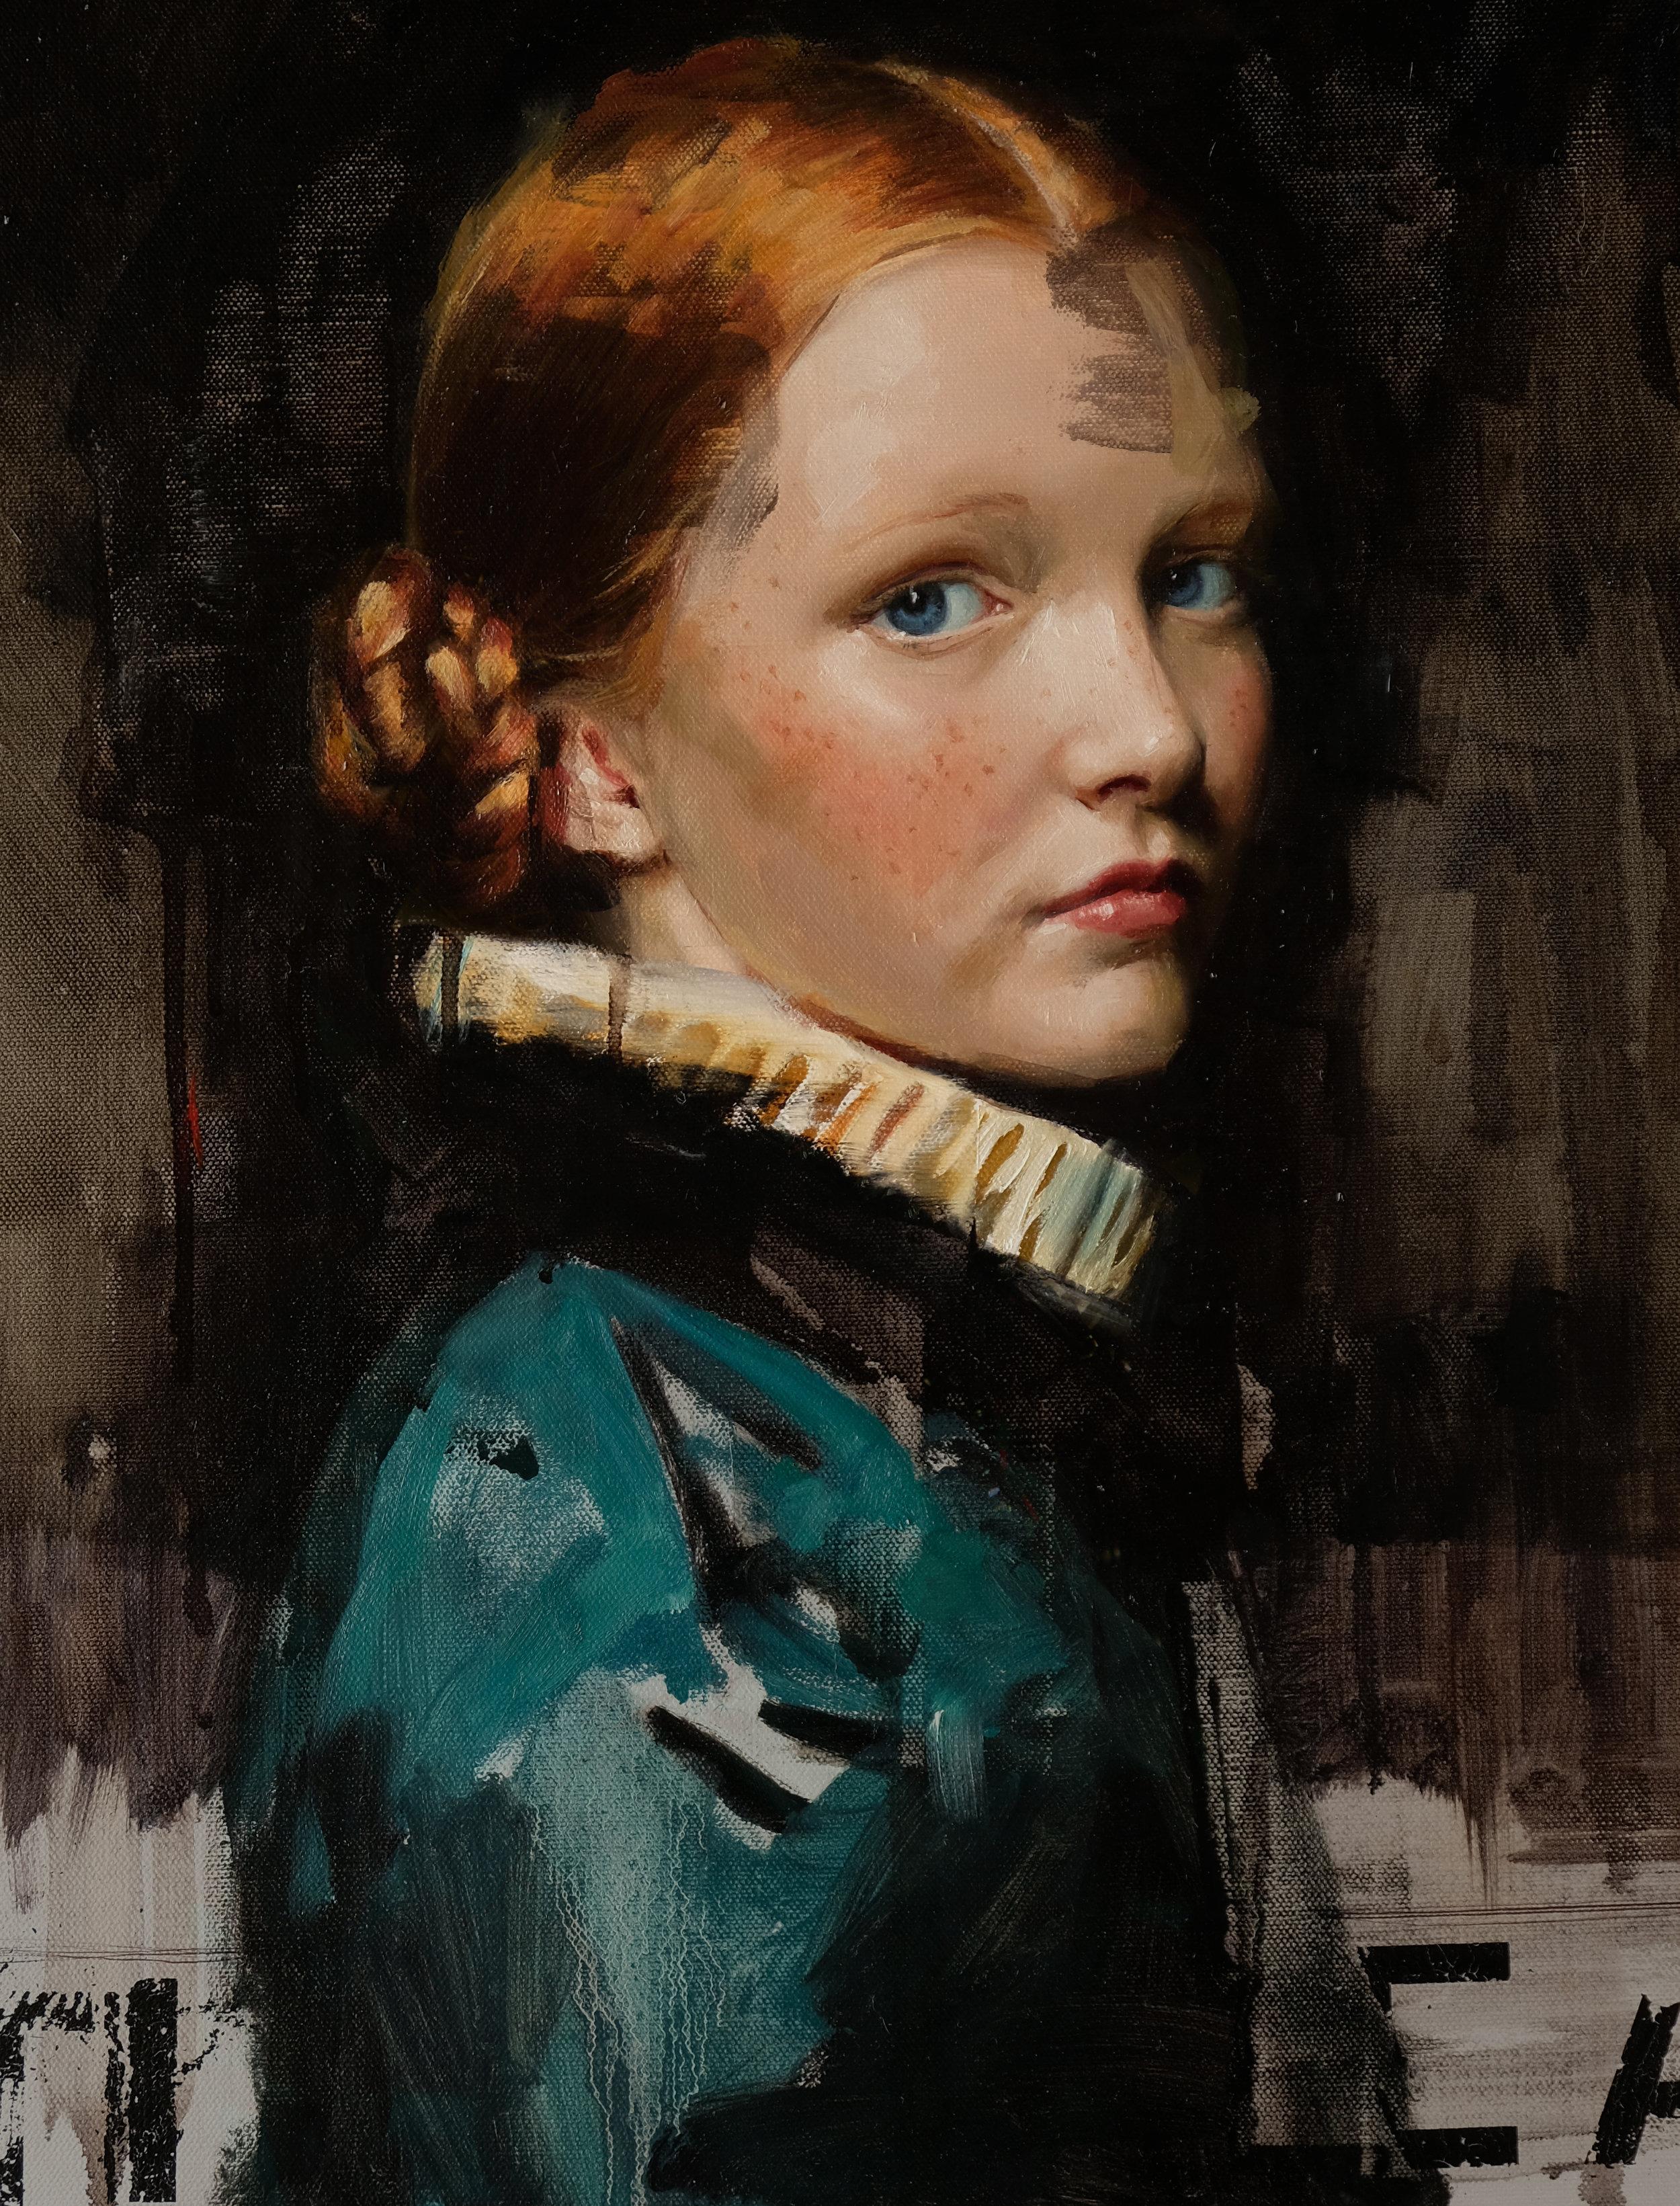 Green 18x24 $1,600 oil on canvas.jpg